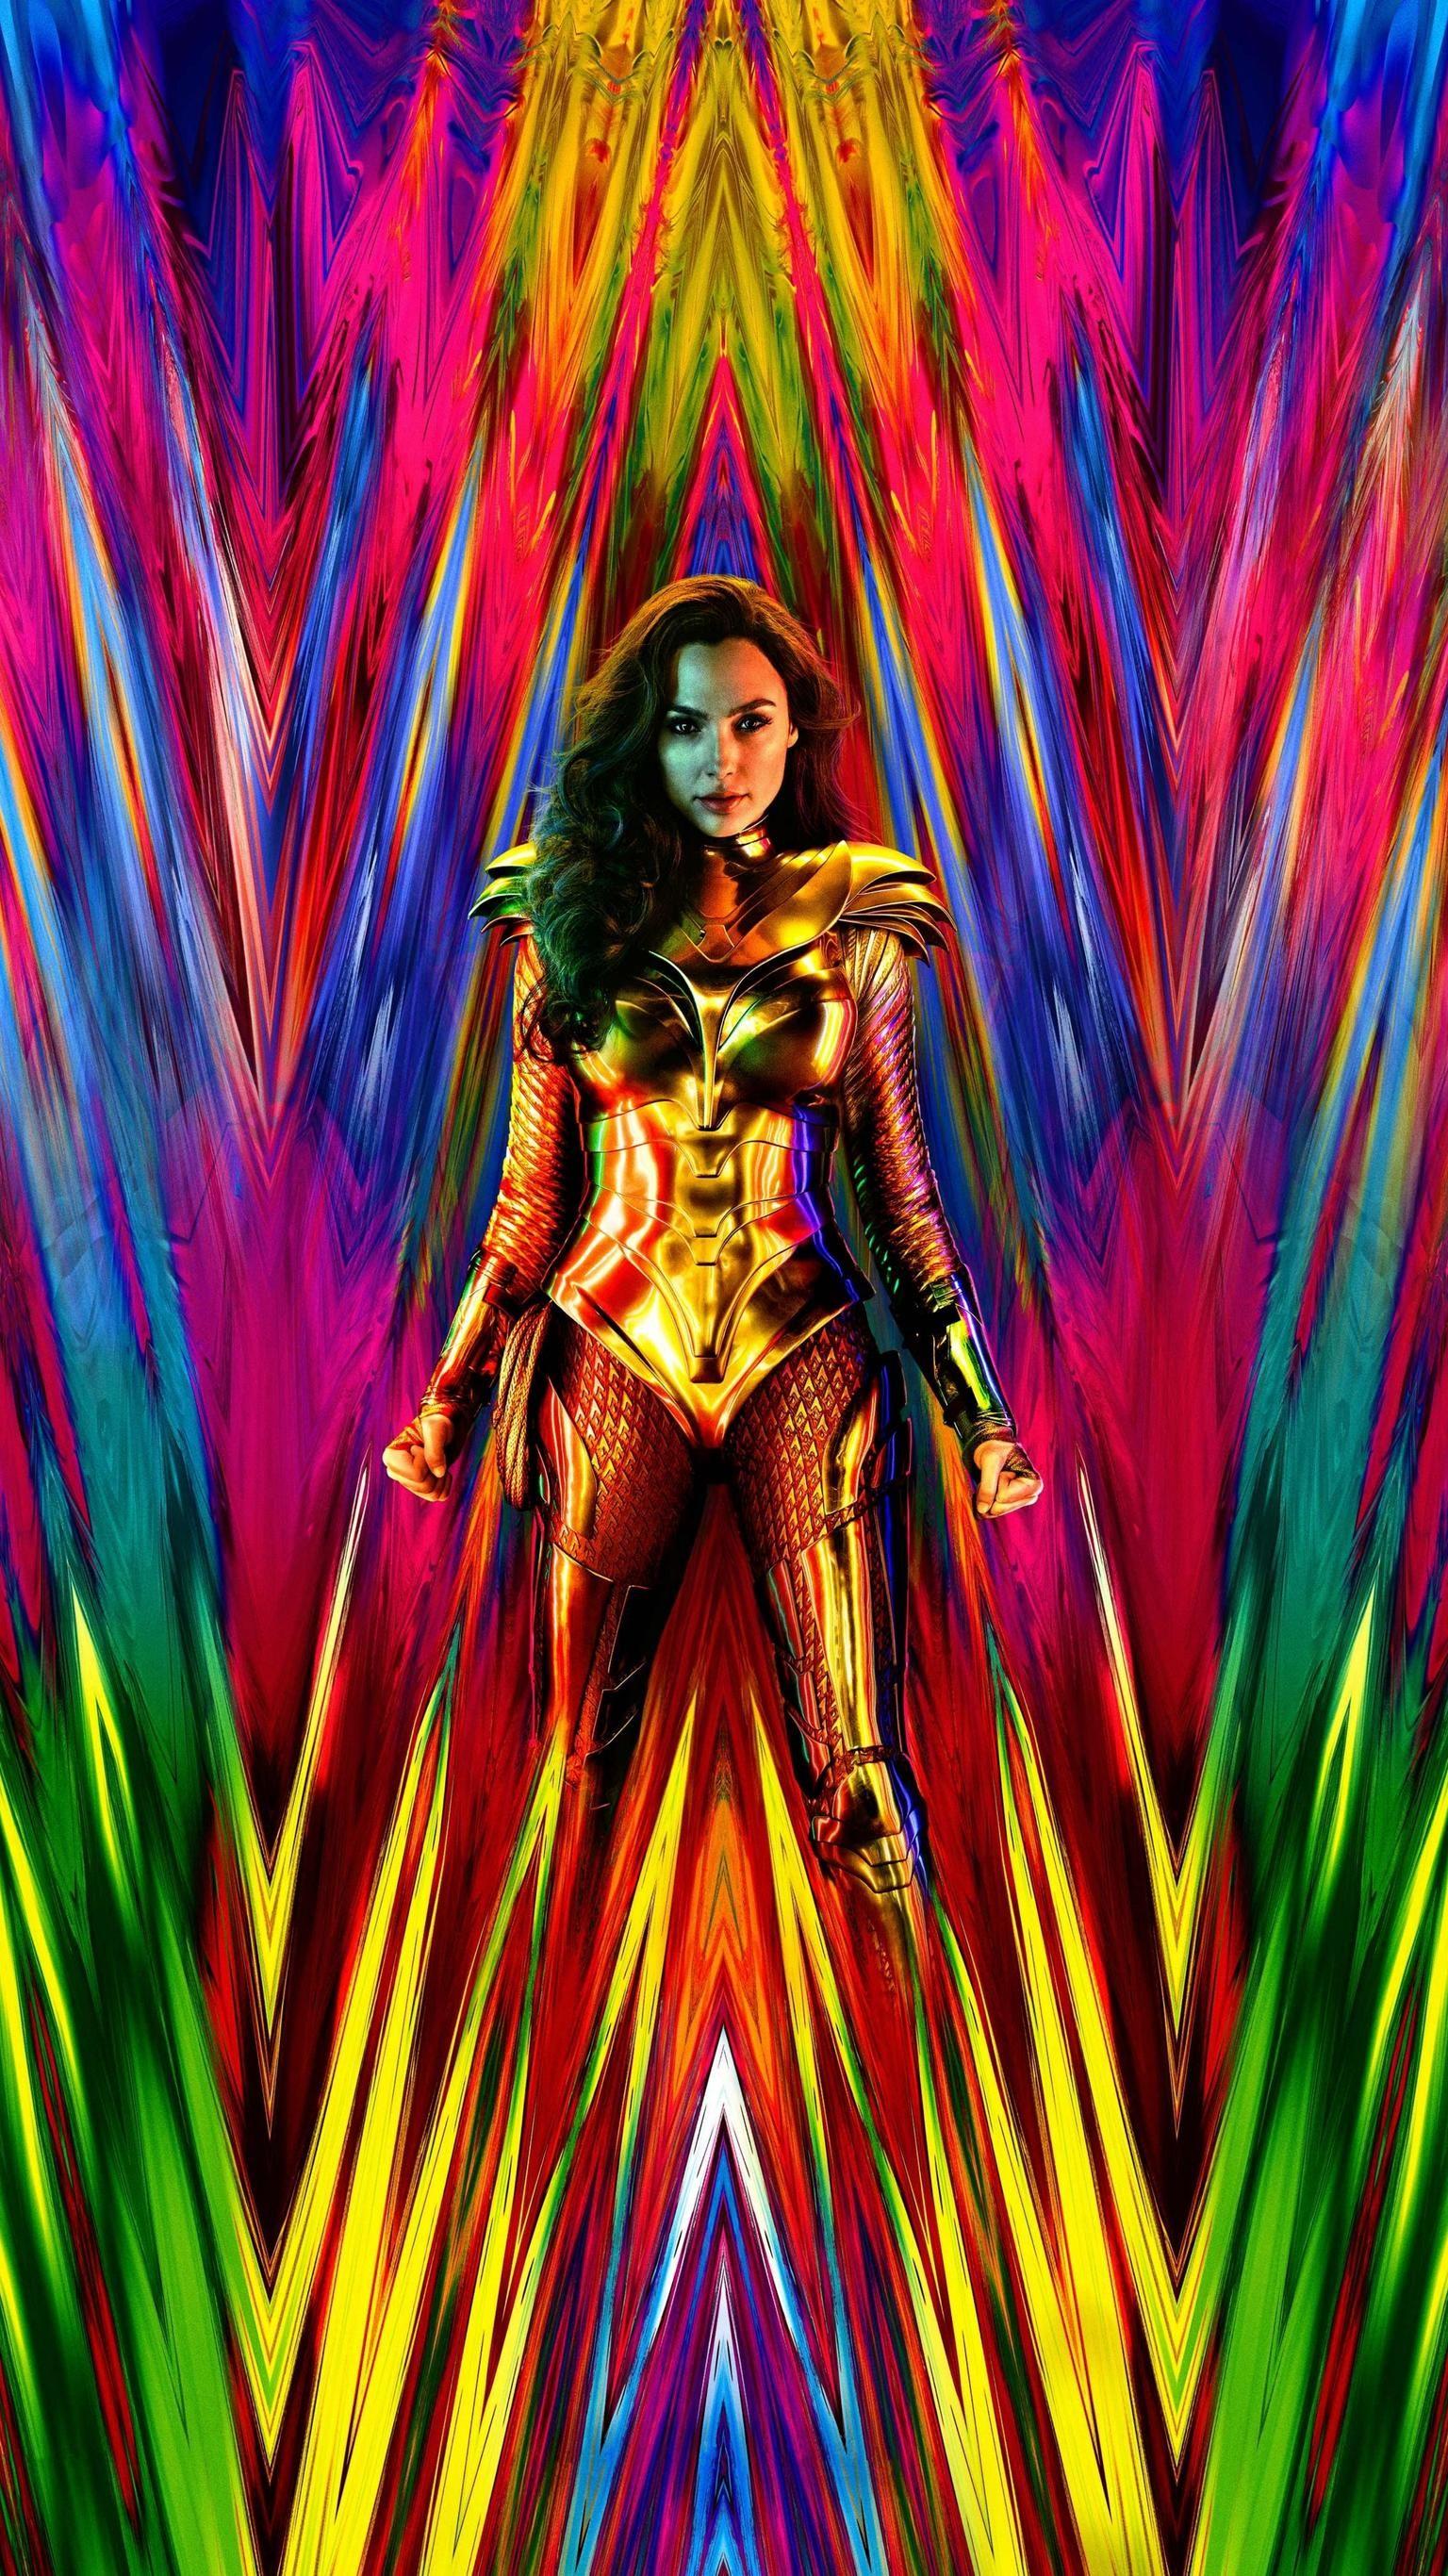 Wonder Woman 1984 2020 Phone Wallpaper Movie Wallpapers 1536x2732